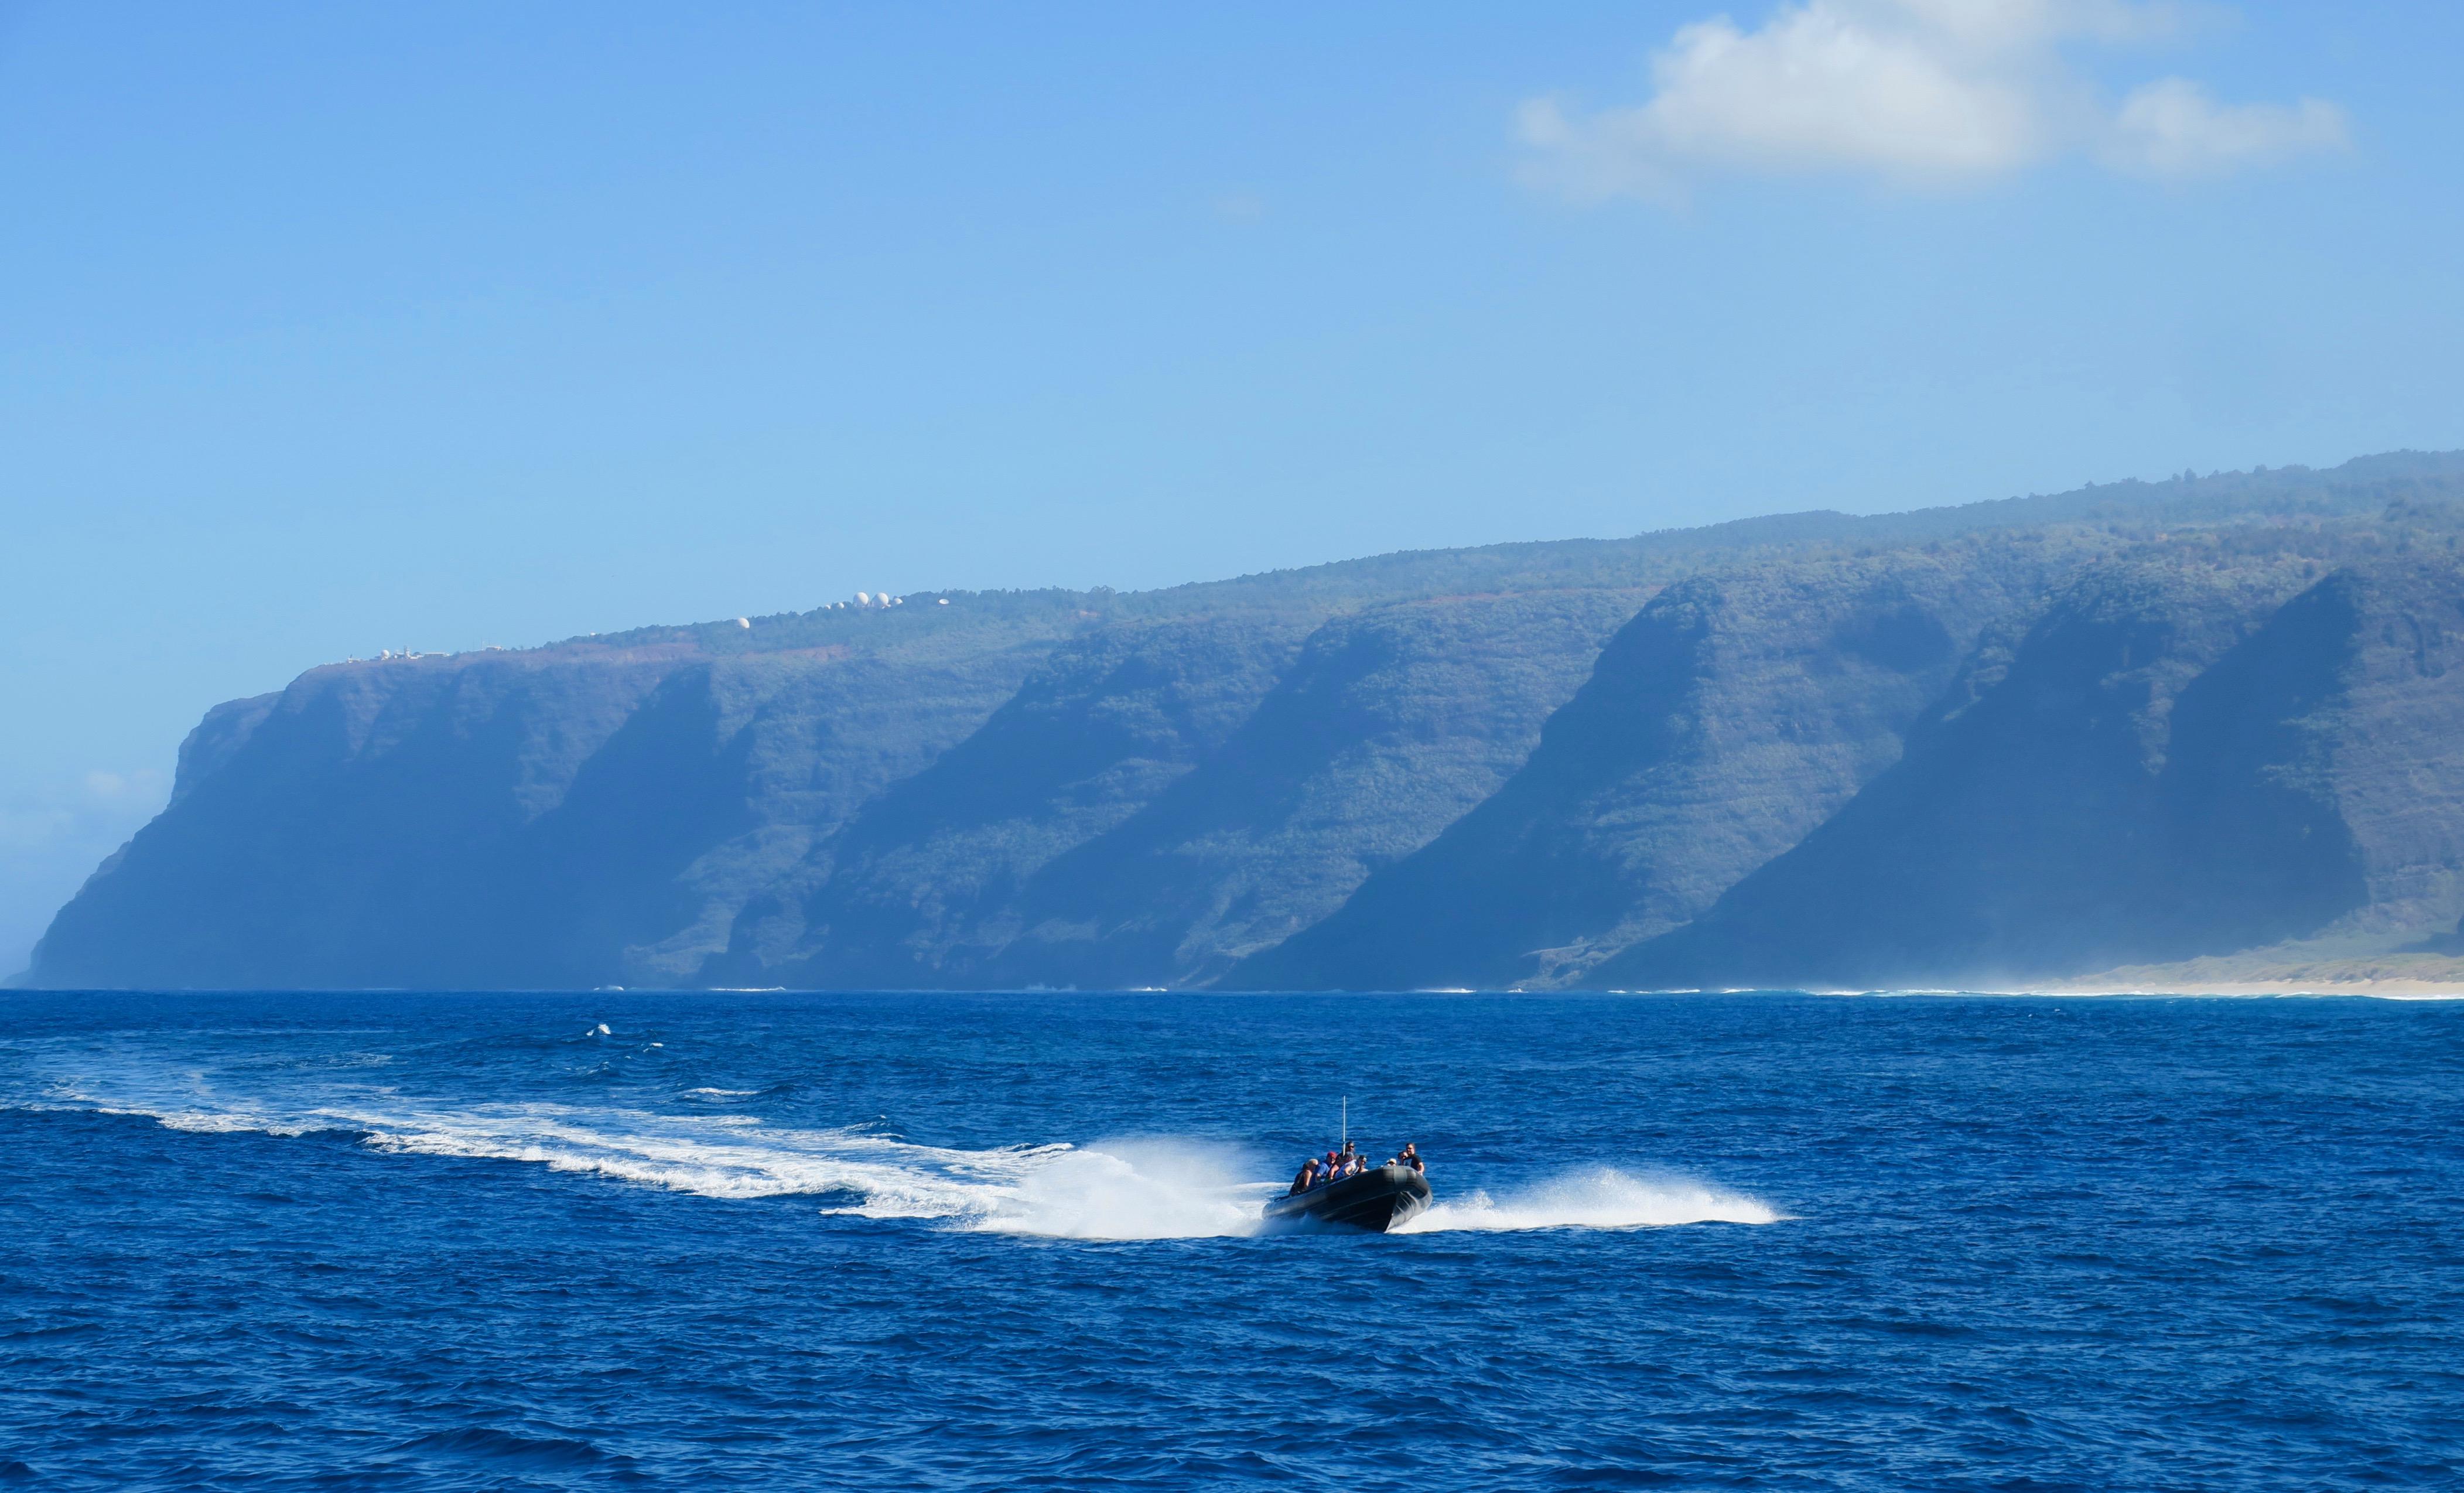 adventure-boat-plying-waters-along-na-pali-coast